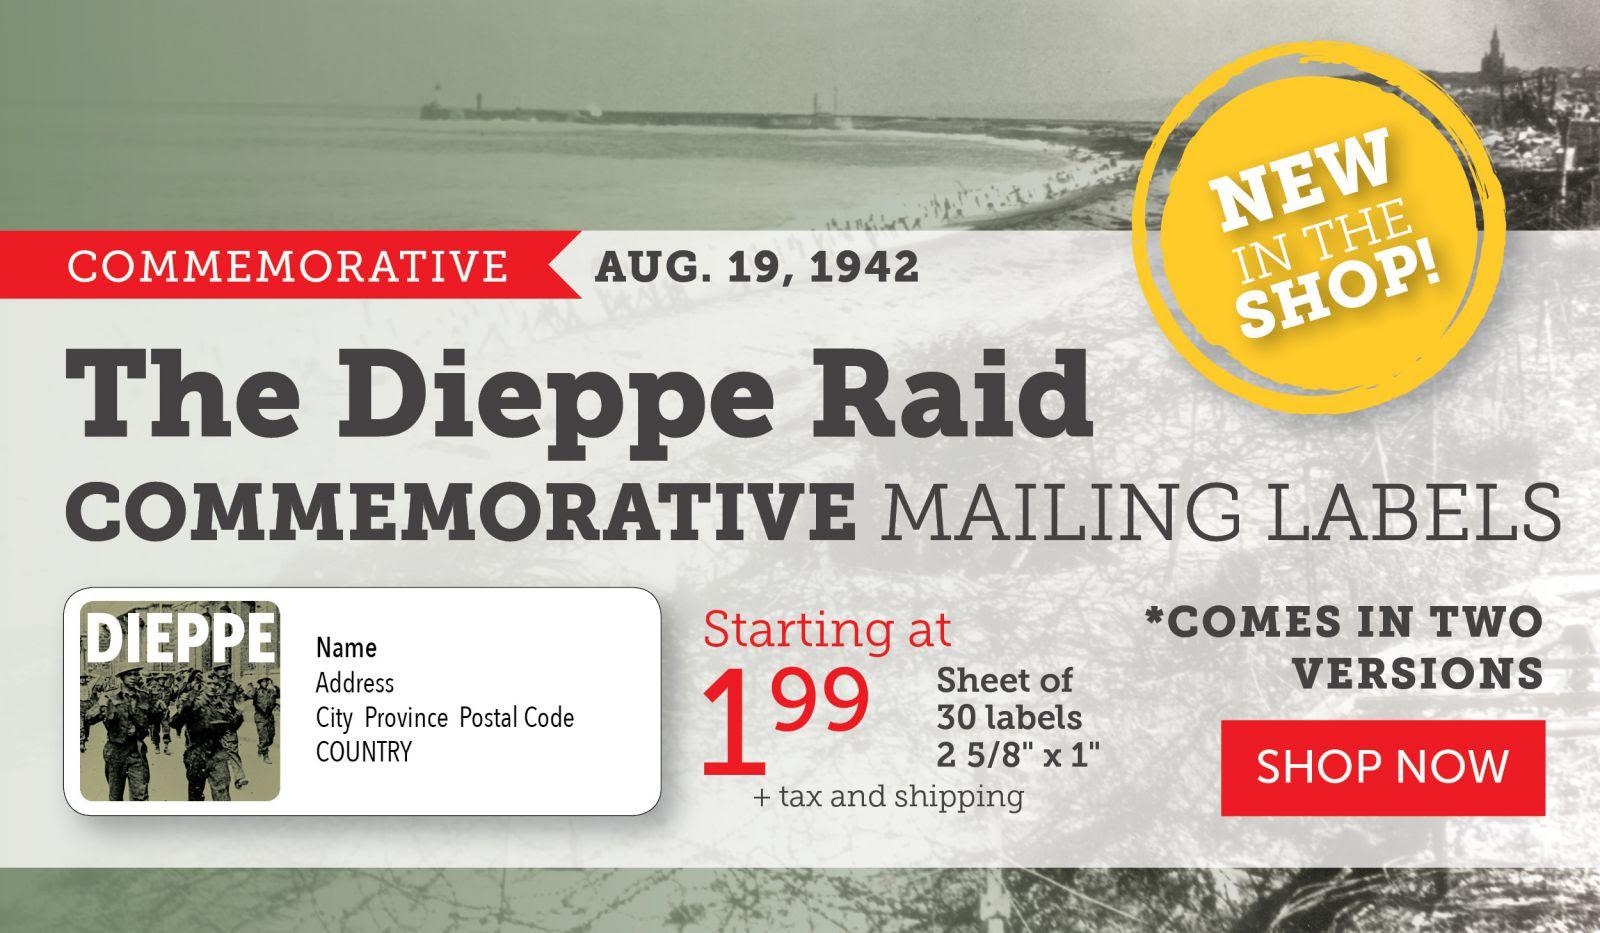 Dieppe Raid Mailing Labels!